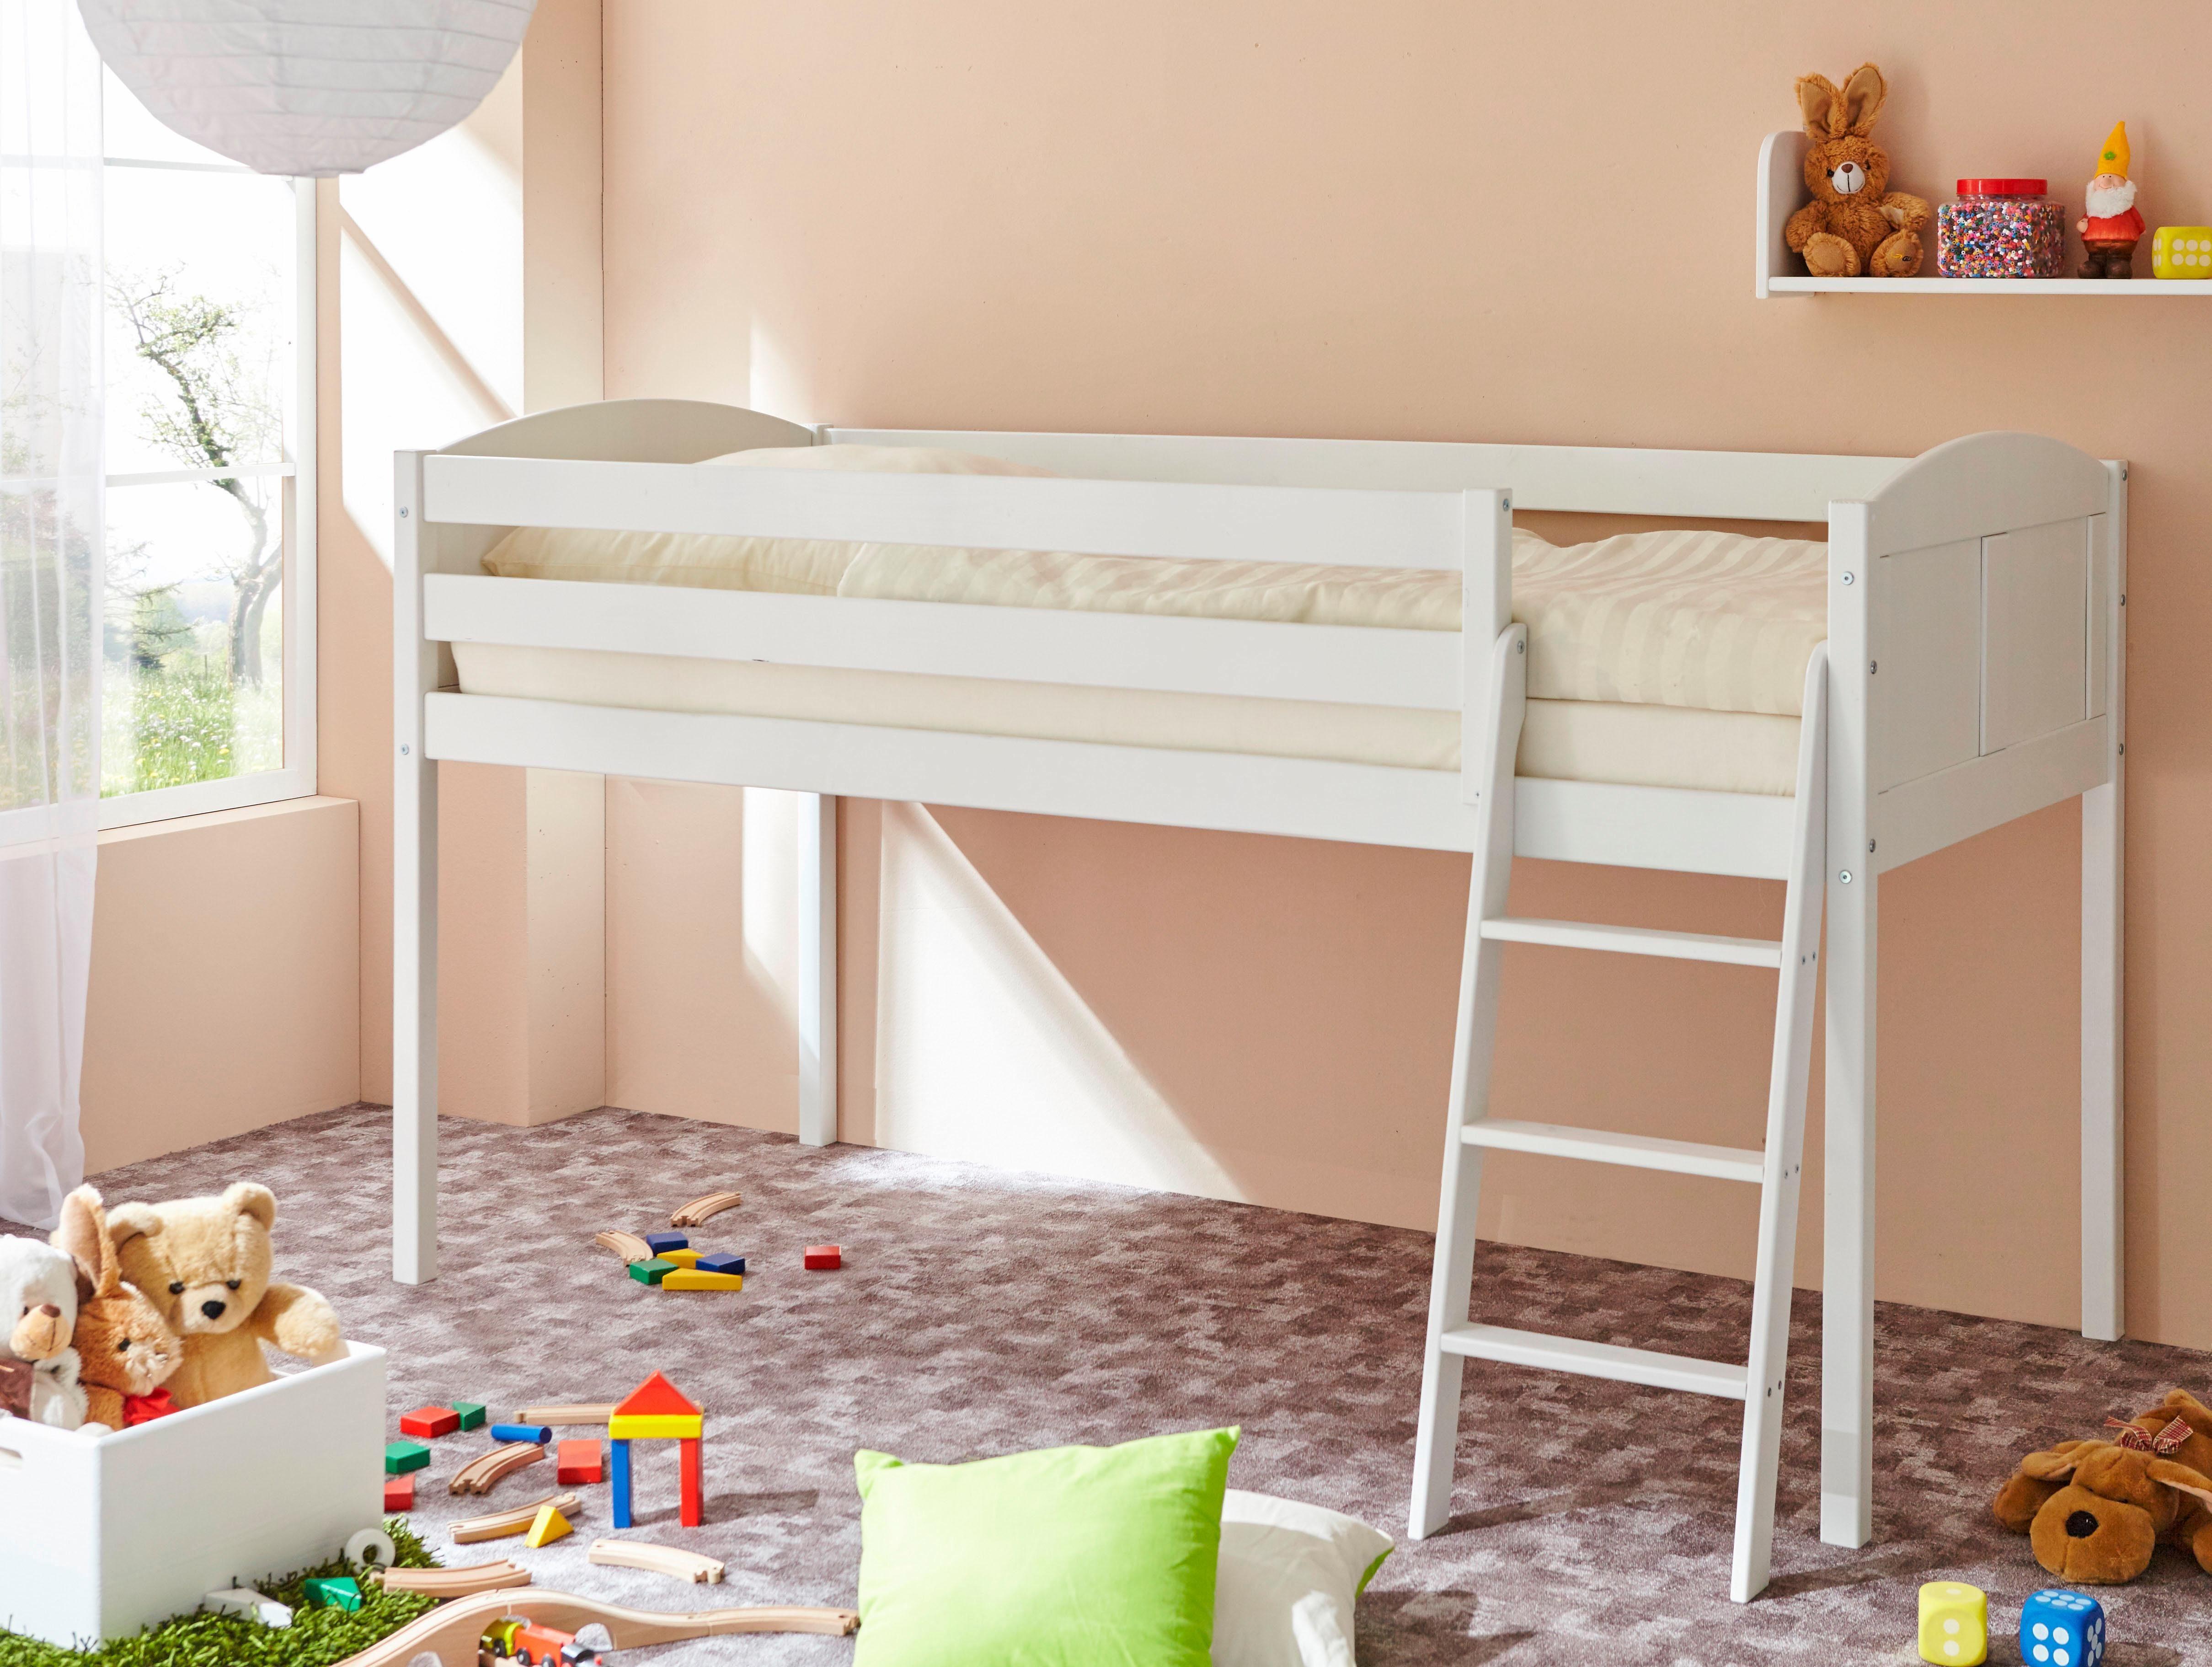 Ticaa Etagenbett Rene : Ticaa etagenbett rene weiß oliver i ab